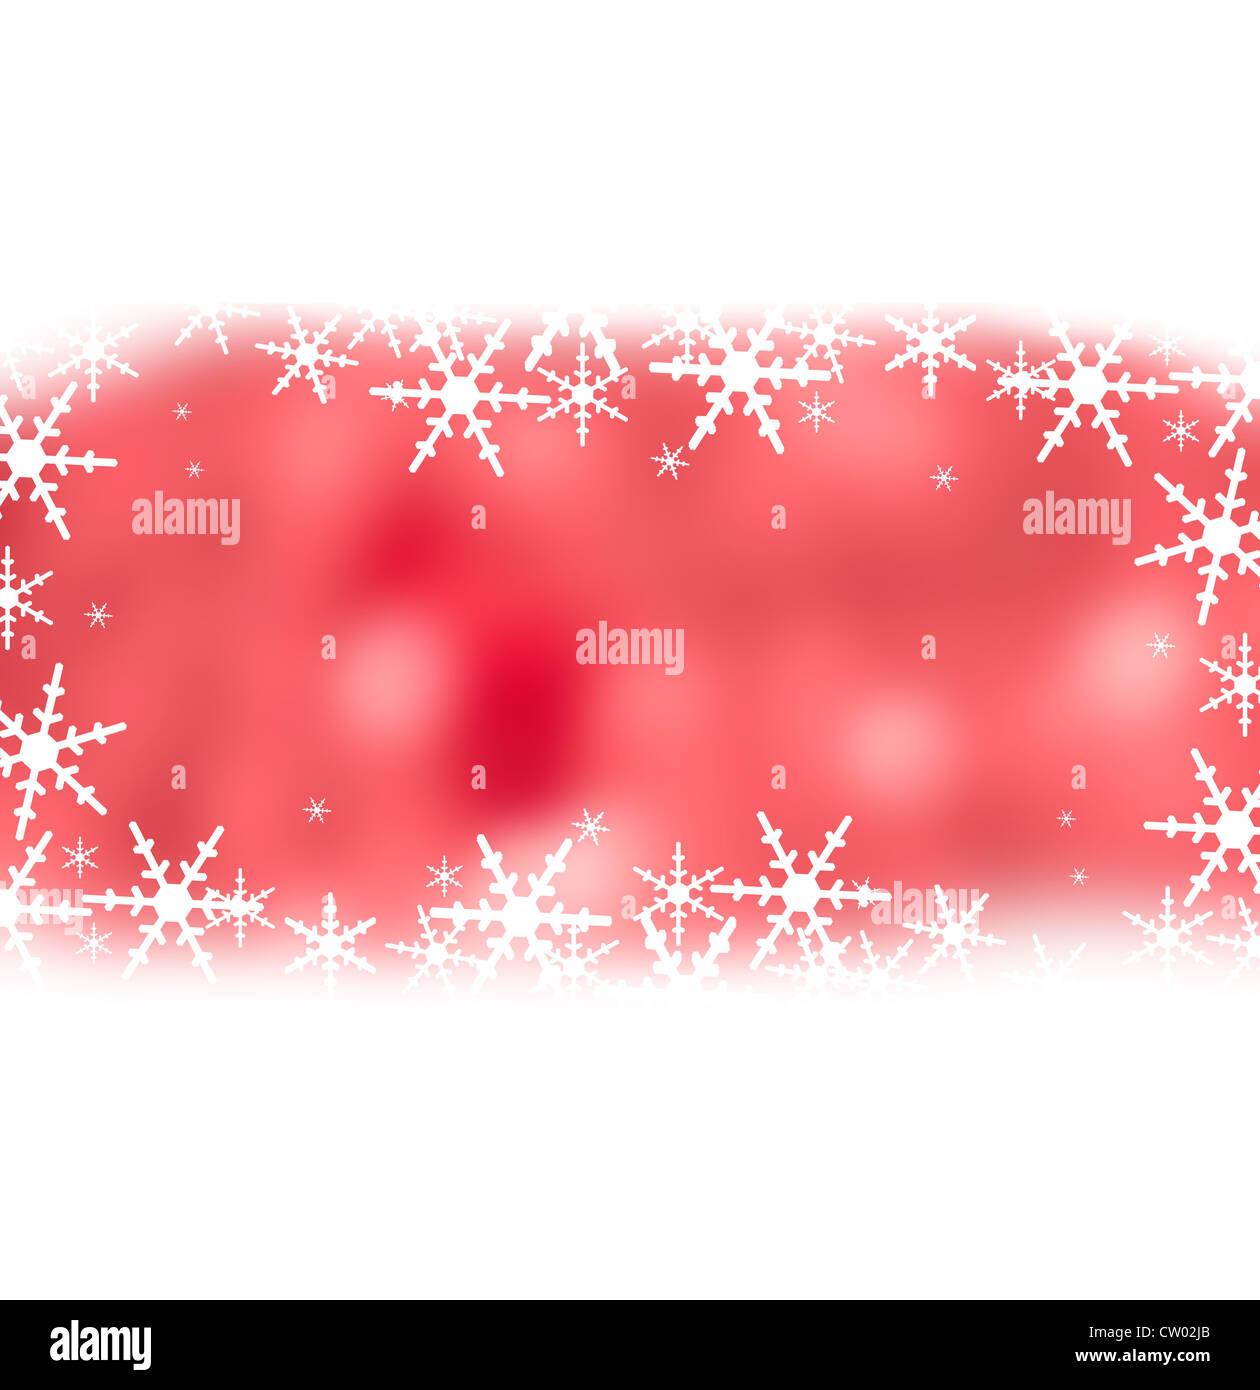 Crystal christmas background - Stock Image